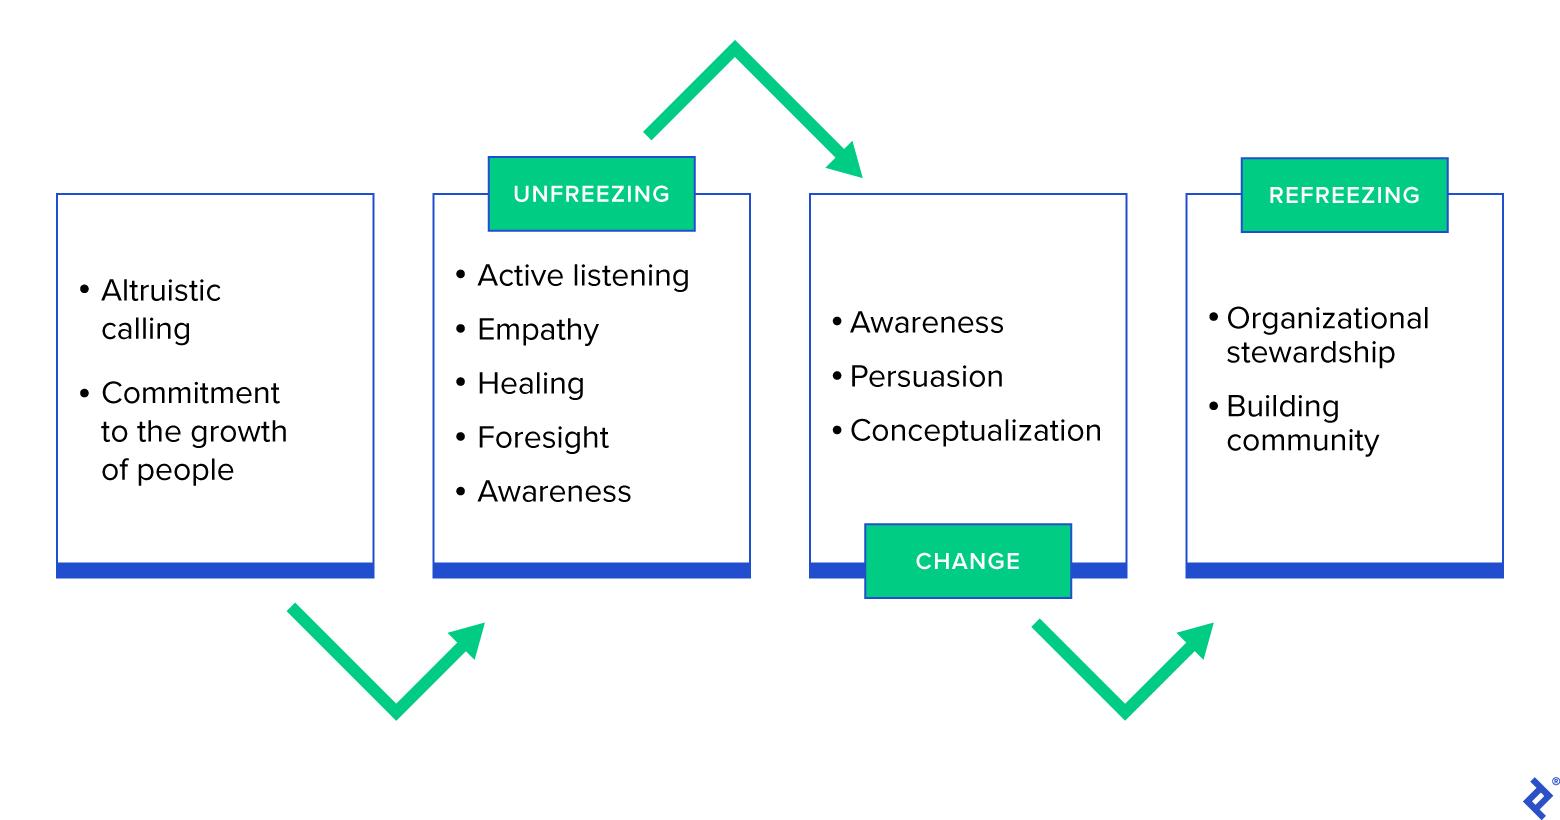 Servant leadership framework for organizational change